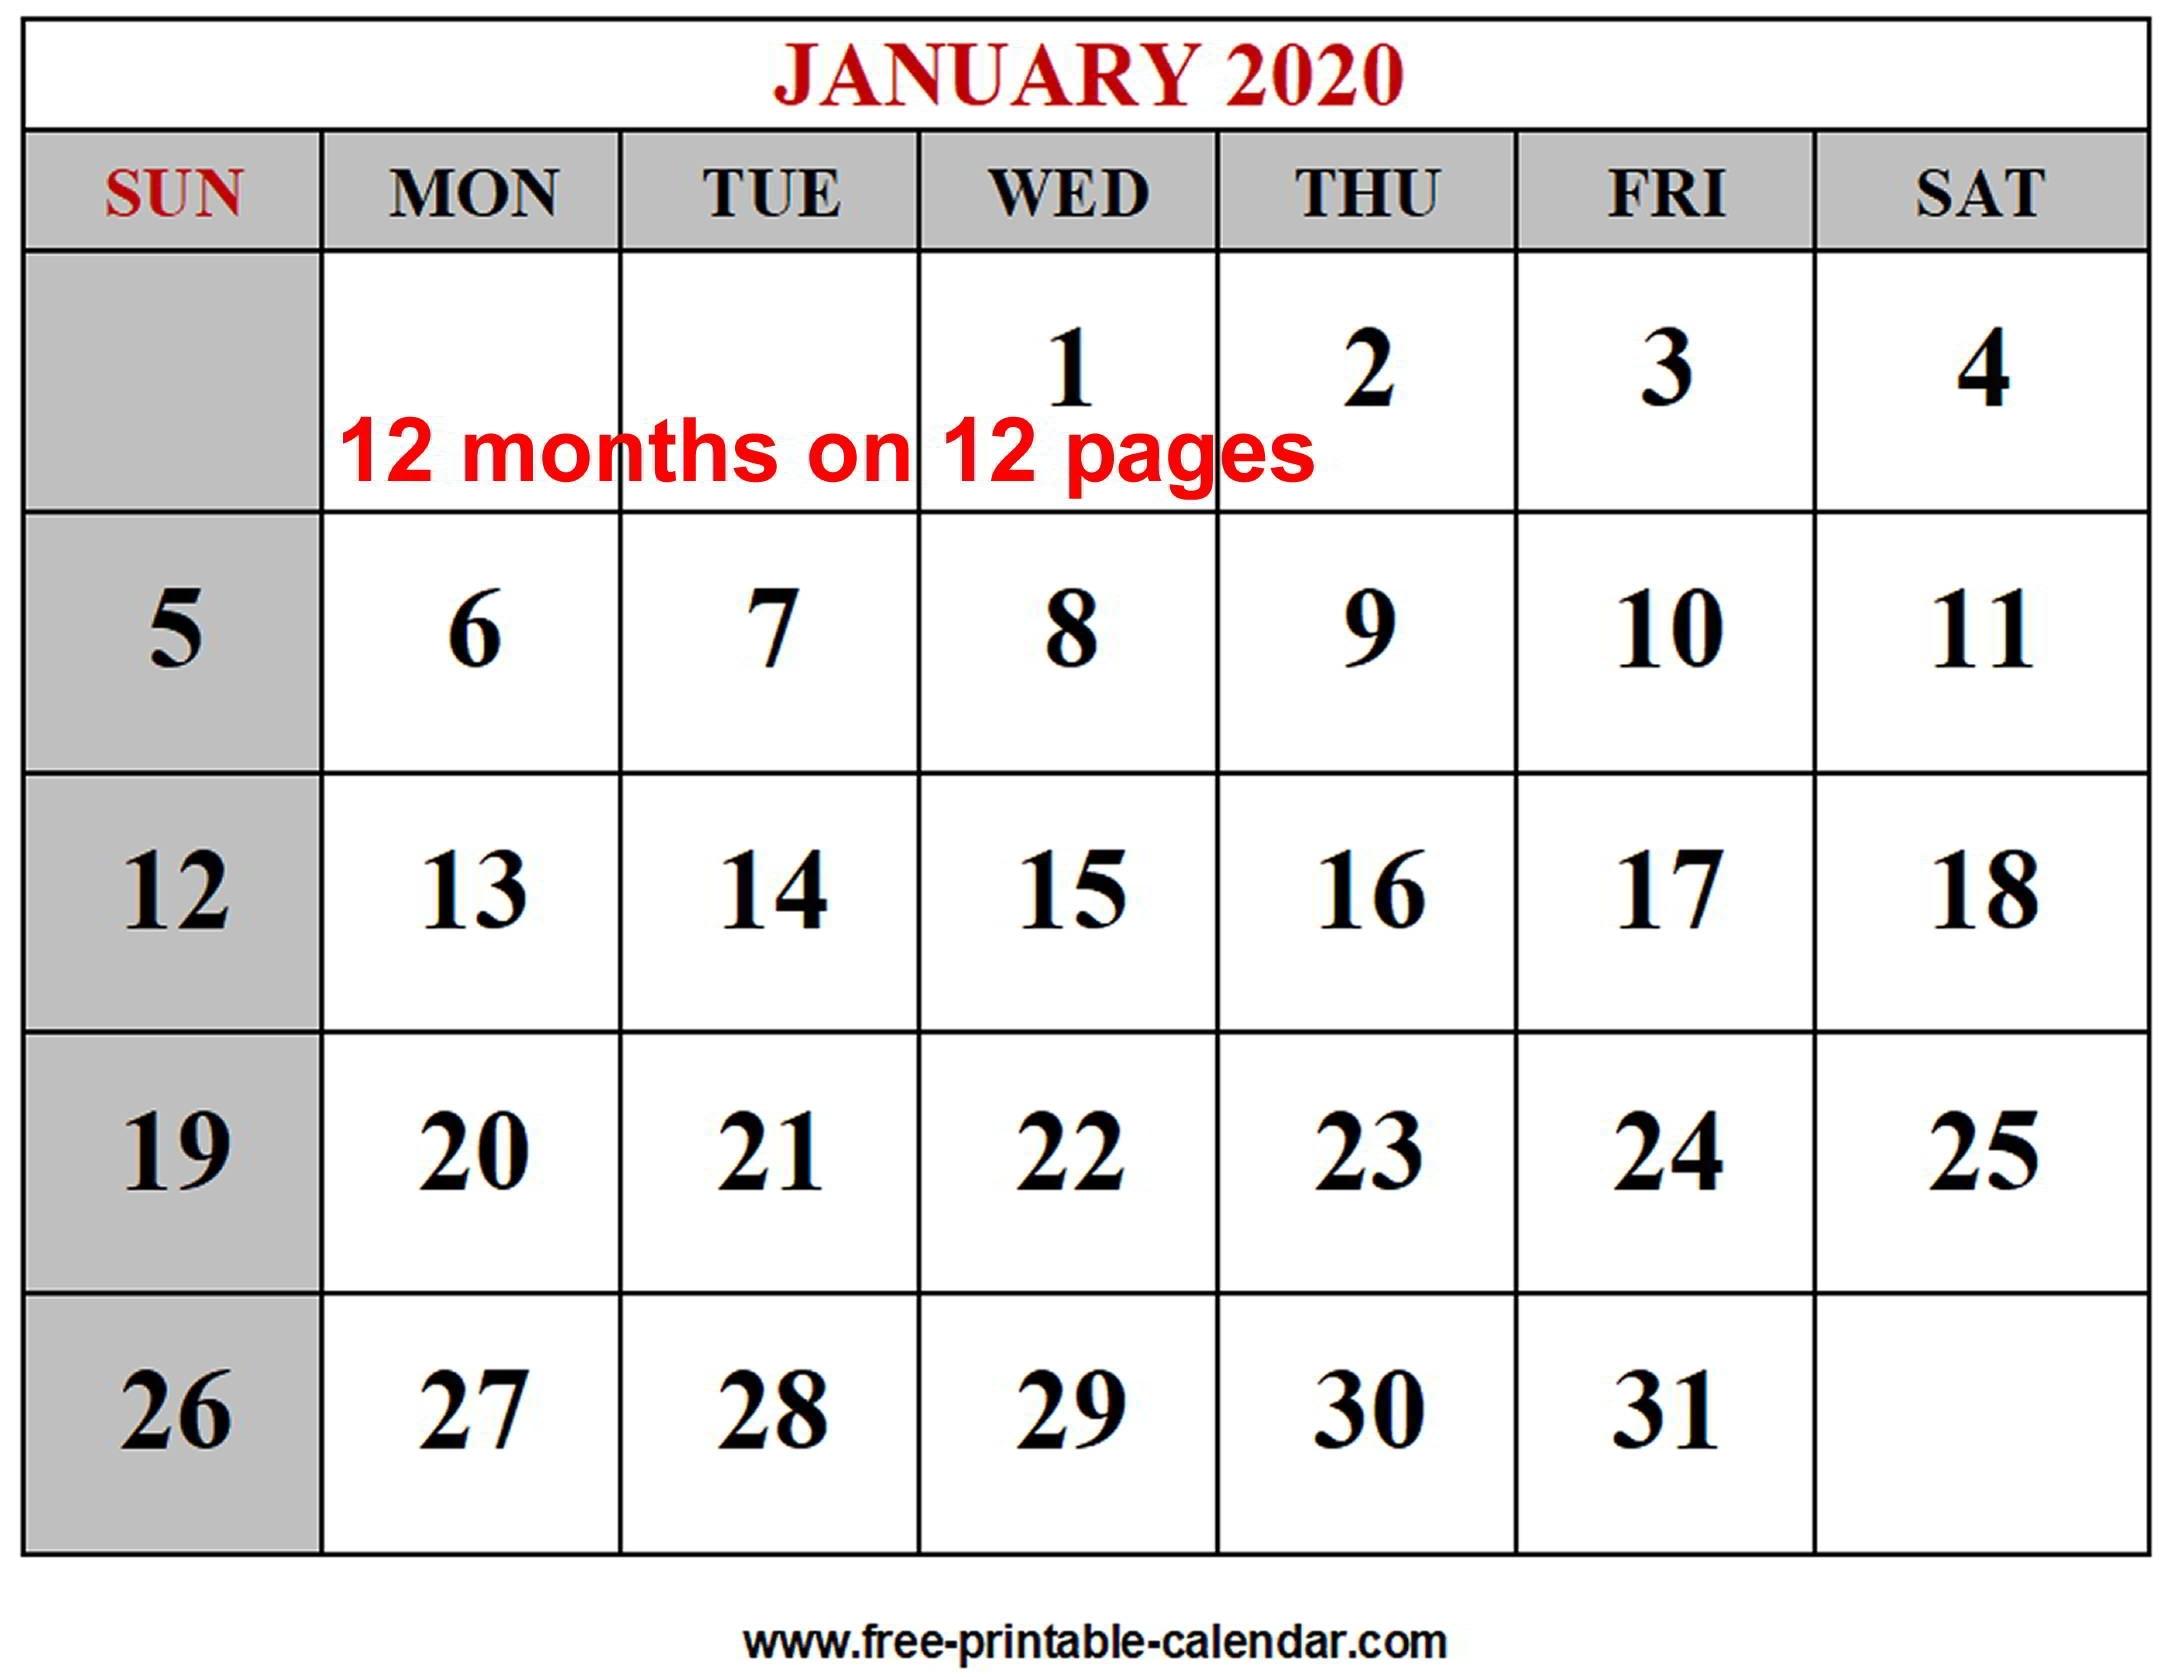 Year 2020 Calendar Templates - Free-Printable-Calendar in 2020 12 Month Calendar Printable